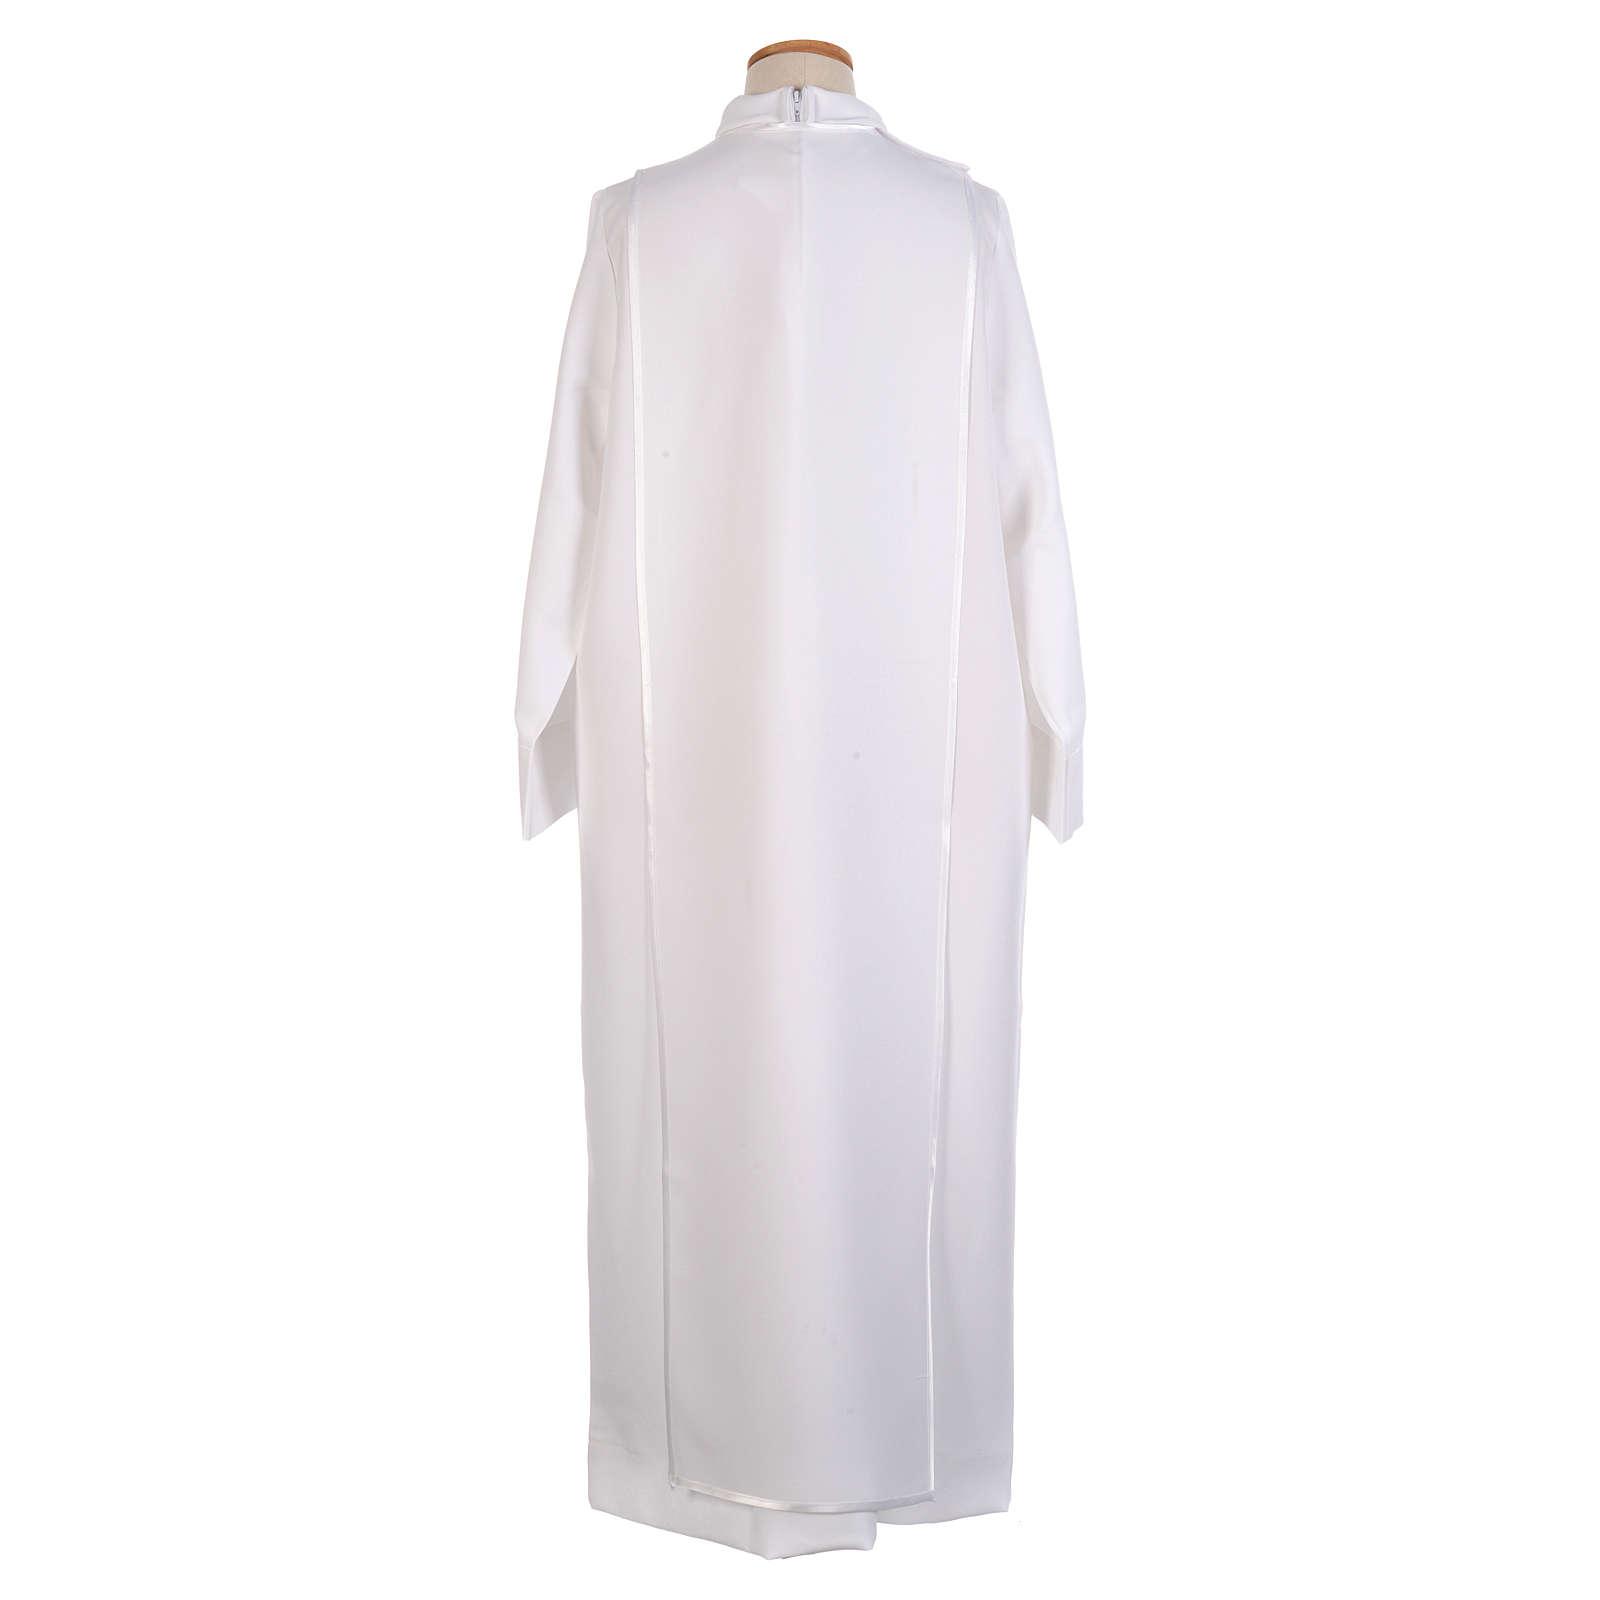 First Communion alb trimmed scapular and eucharistic symbols 4